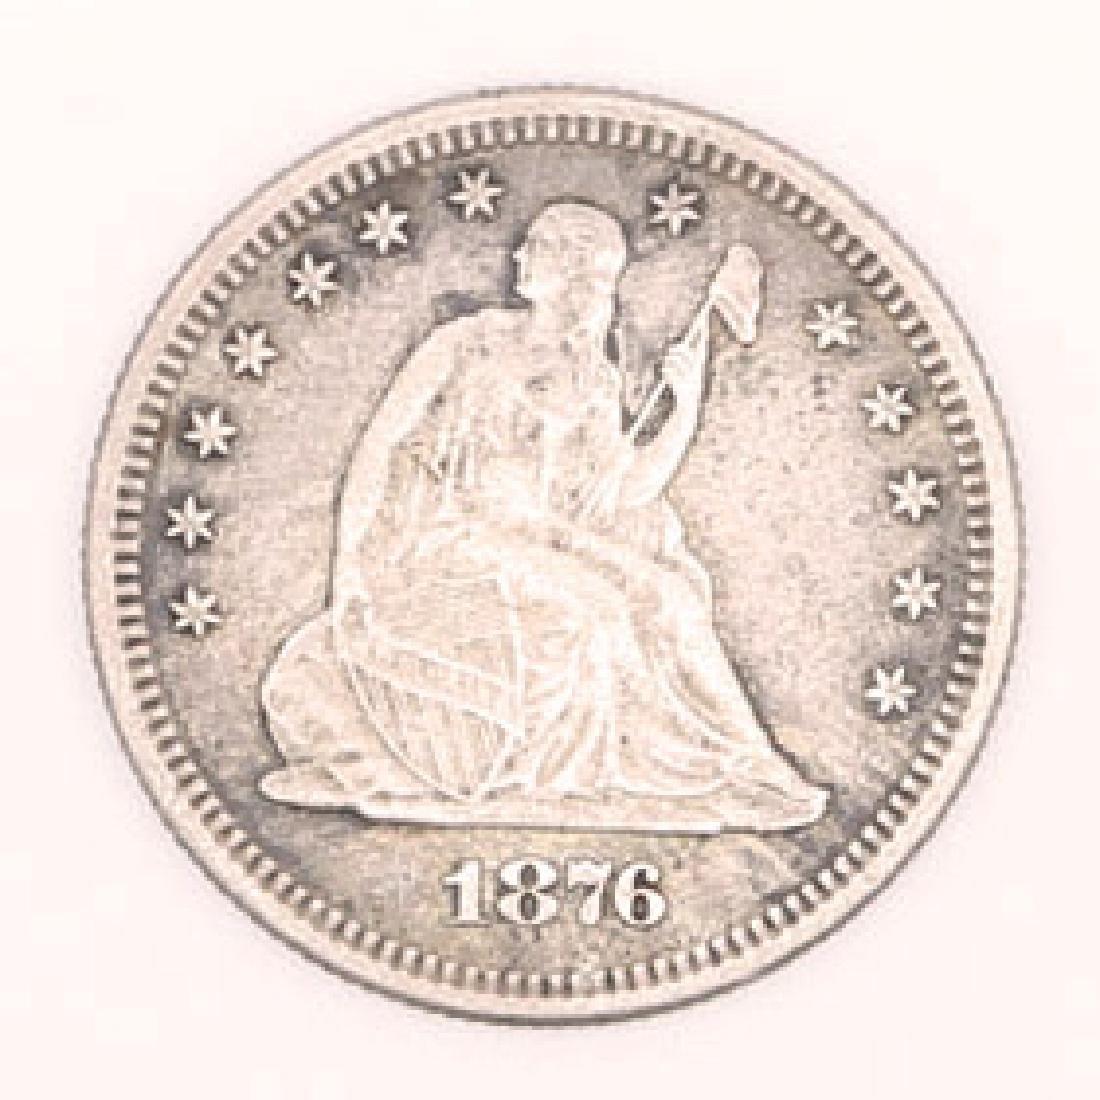 1876 SAN FRANCISCO SEATED LIBERTY QUARTER